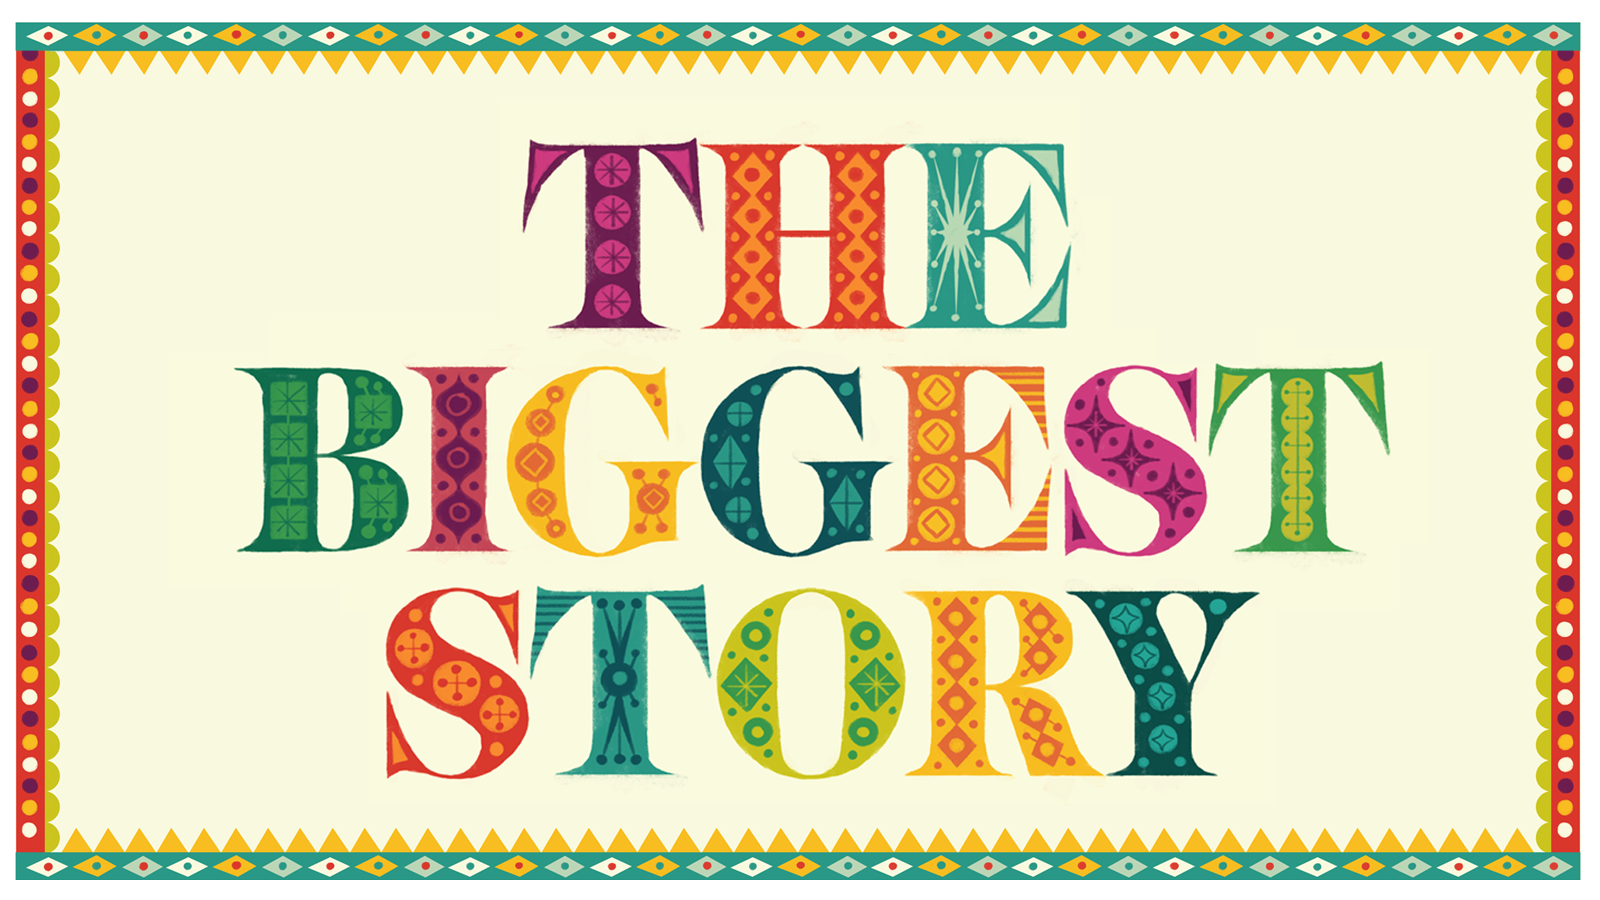 Biggest story series logo